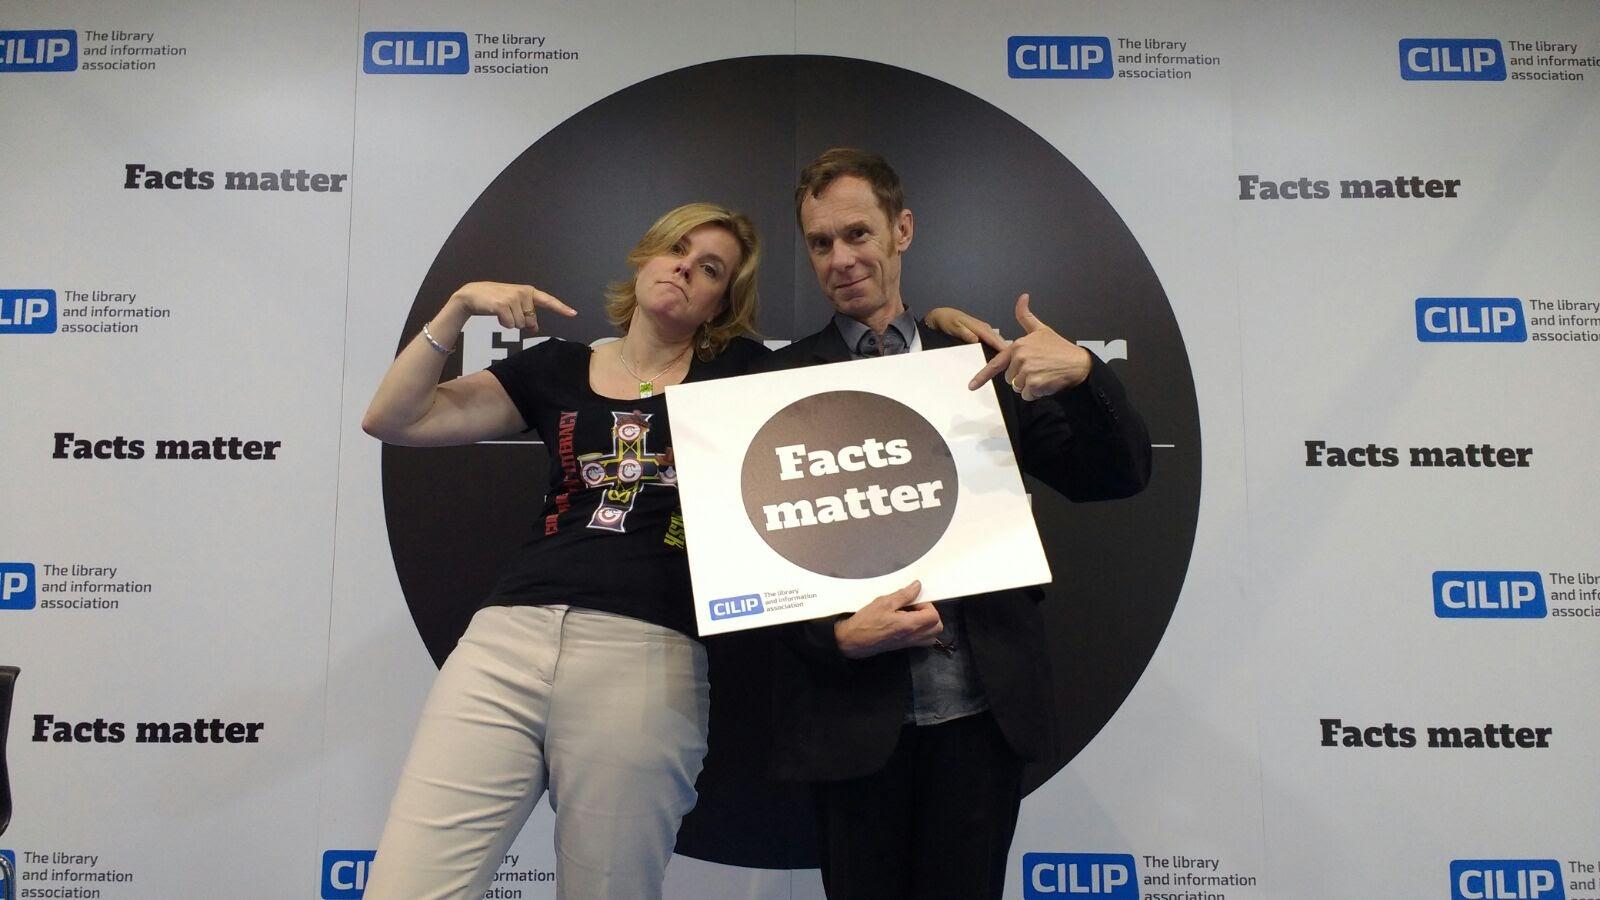 Jane Secker and ILG member Charlie Inskip take a stand for #FactsMatter